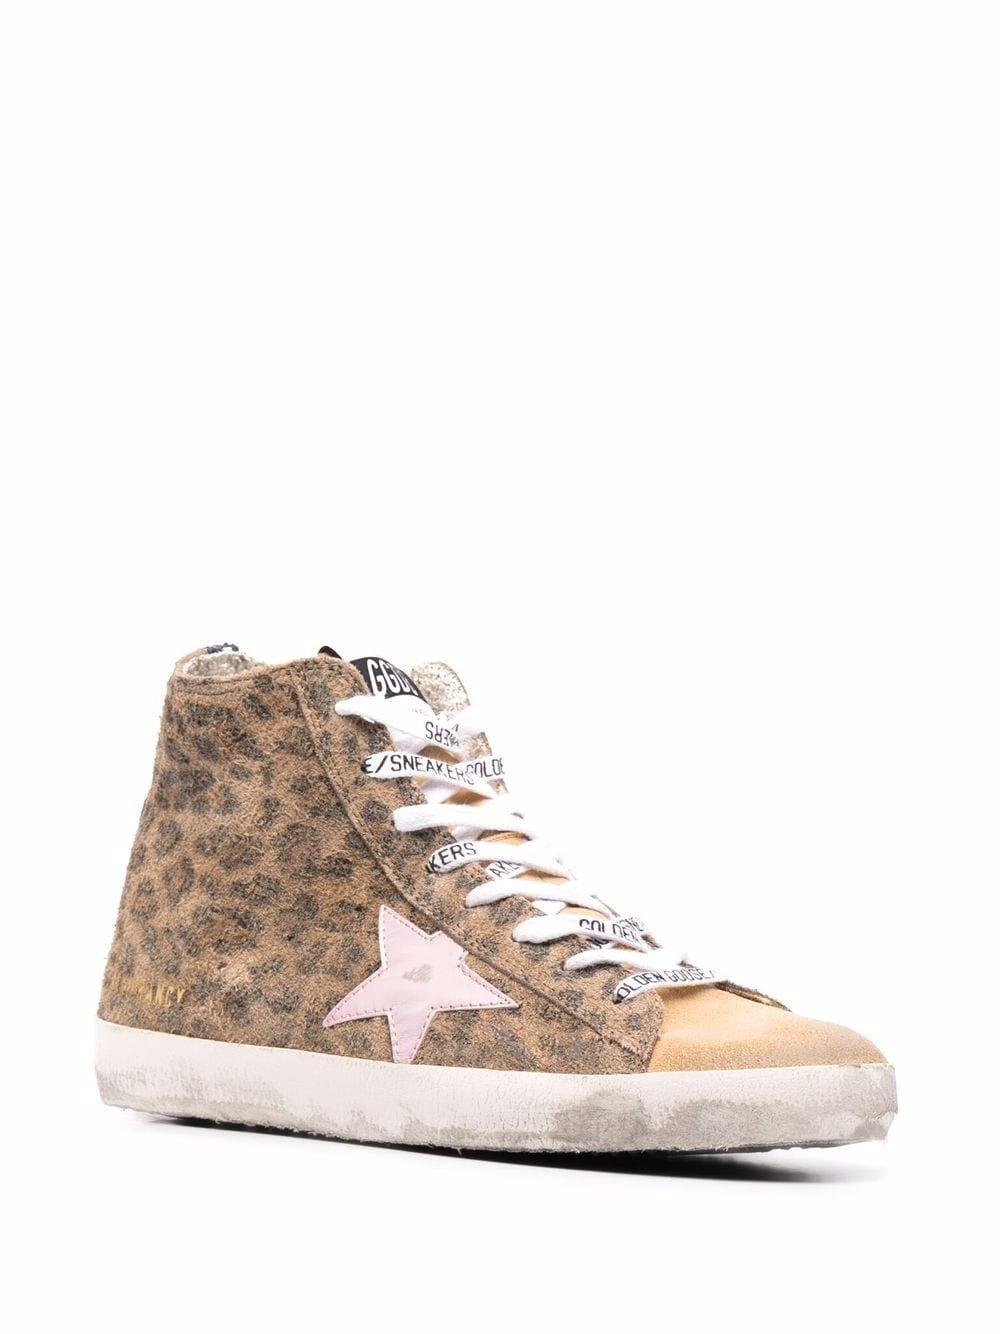 Picture of Golden Goose Deluxe Brand | Francy Leopard-Print Sneakers